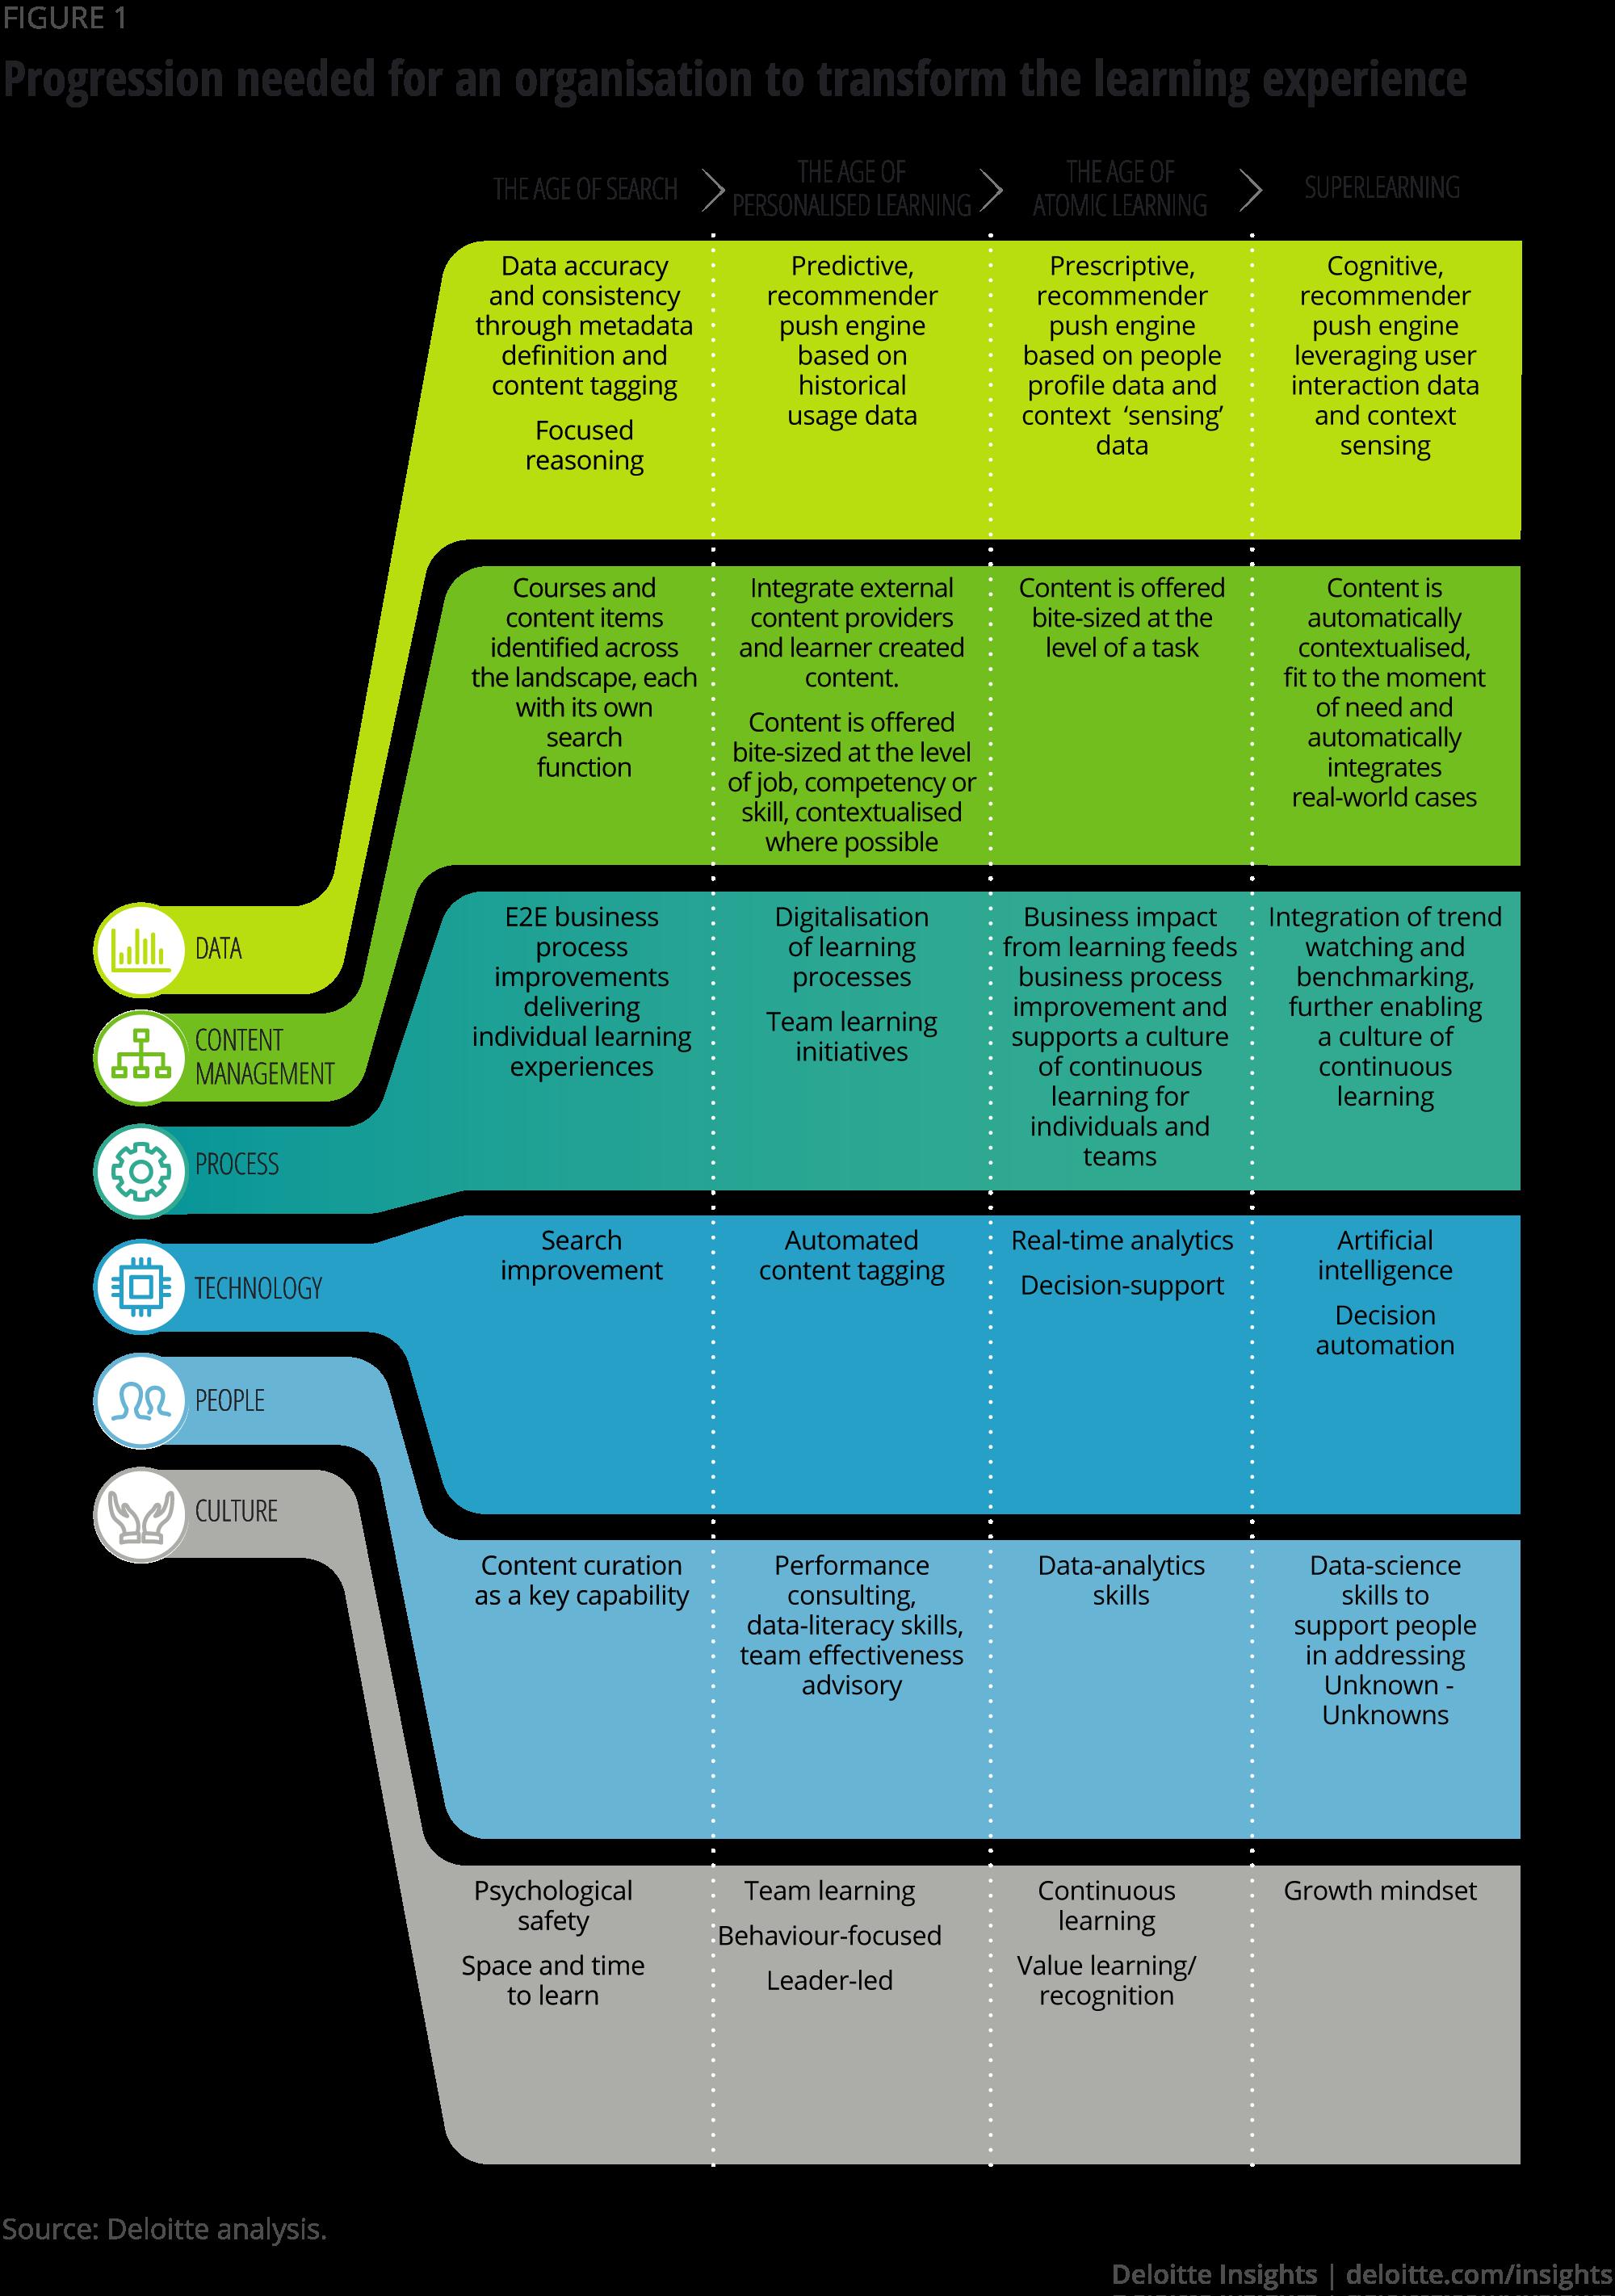 Superlearning Reskilling The Workforce Deloitte Insights